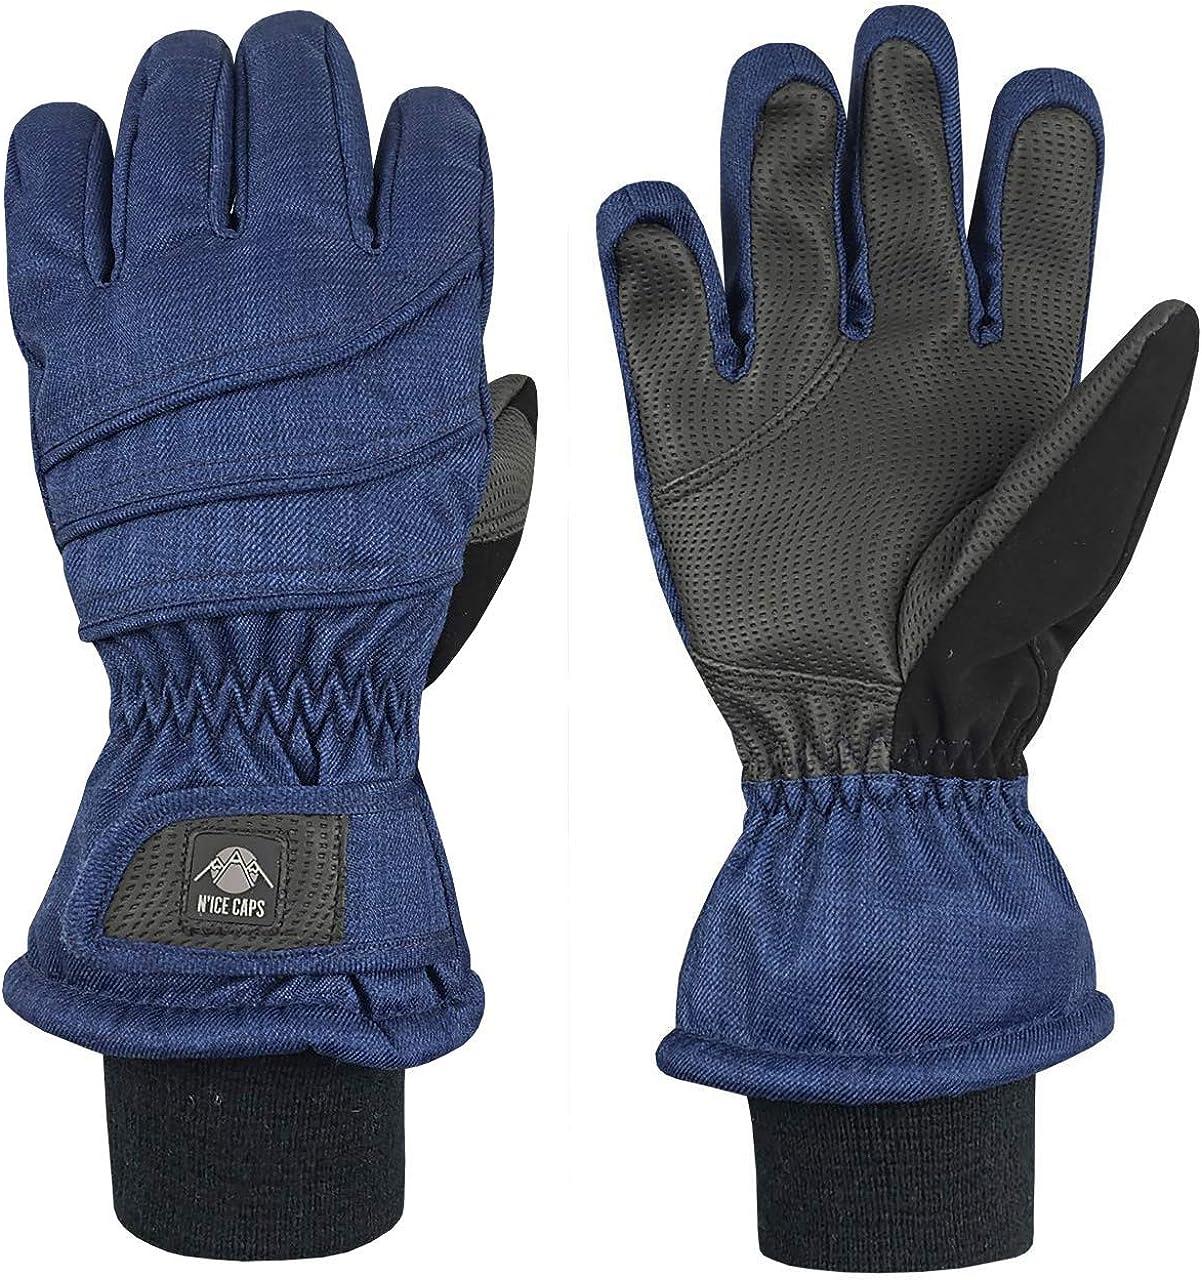 N'Ice Caps Kids Thinsulate Waterproof Bulky Winter Snow Ski Glove With Ridges